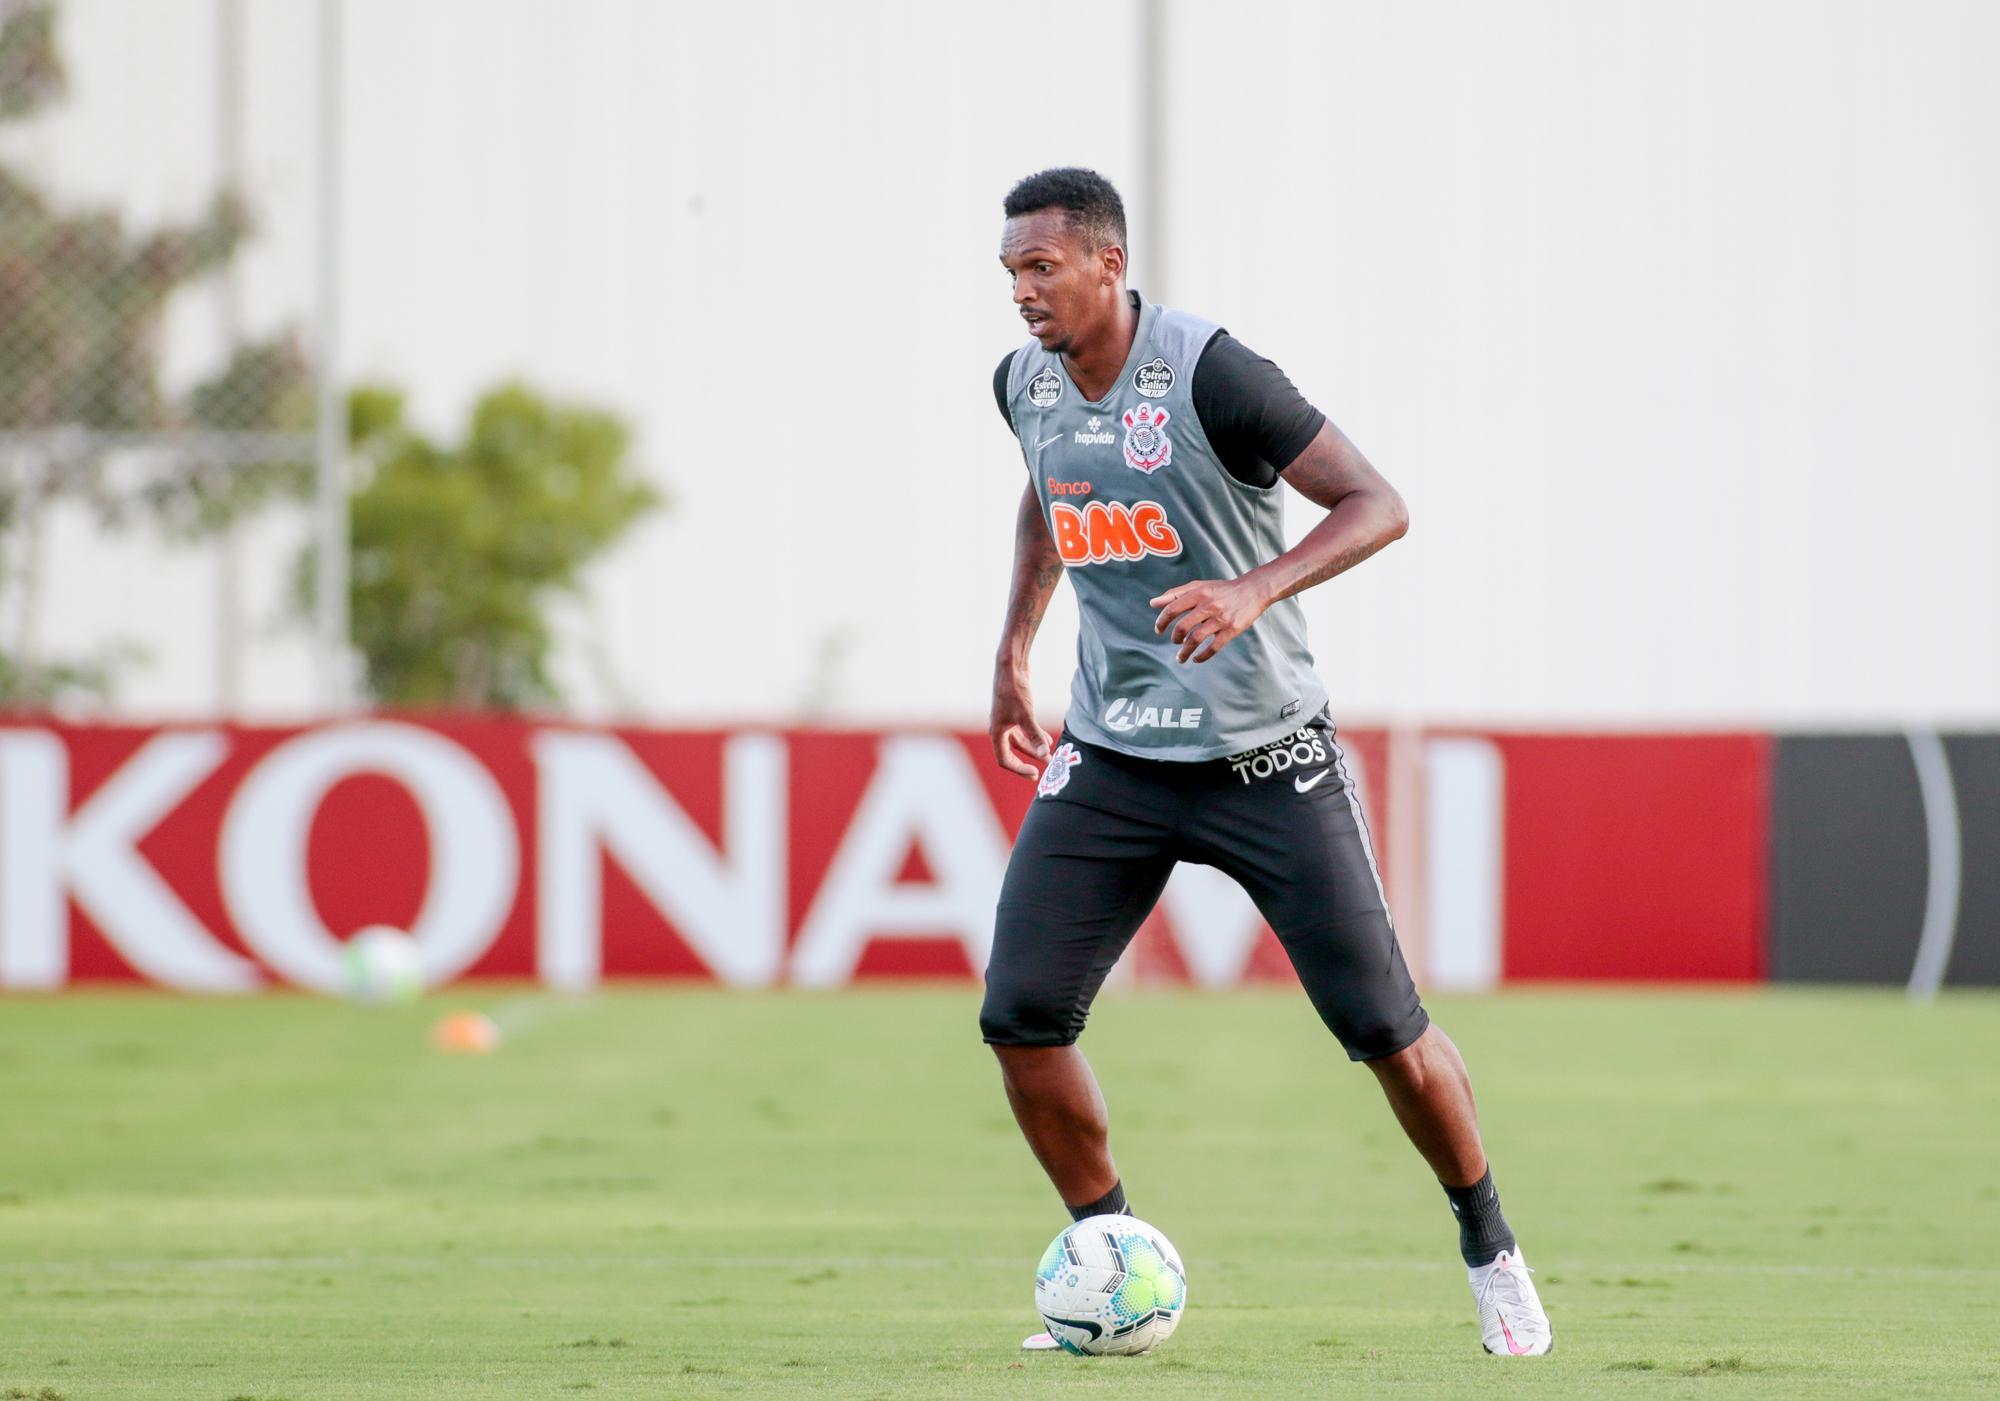 Centroavante Jô custará milhões ao Corinthians